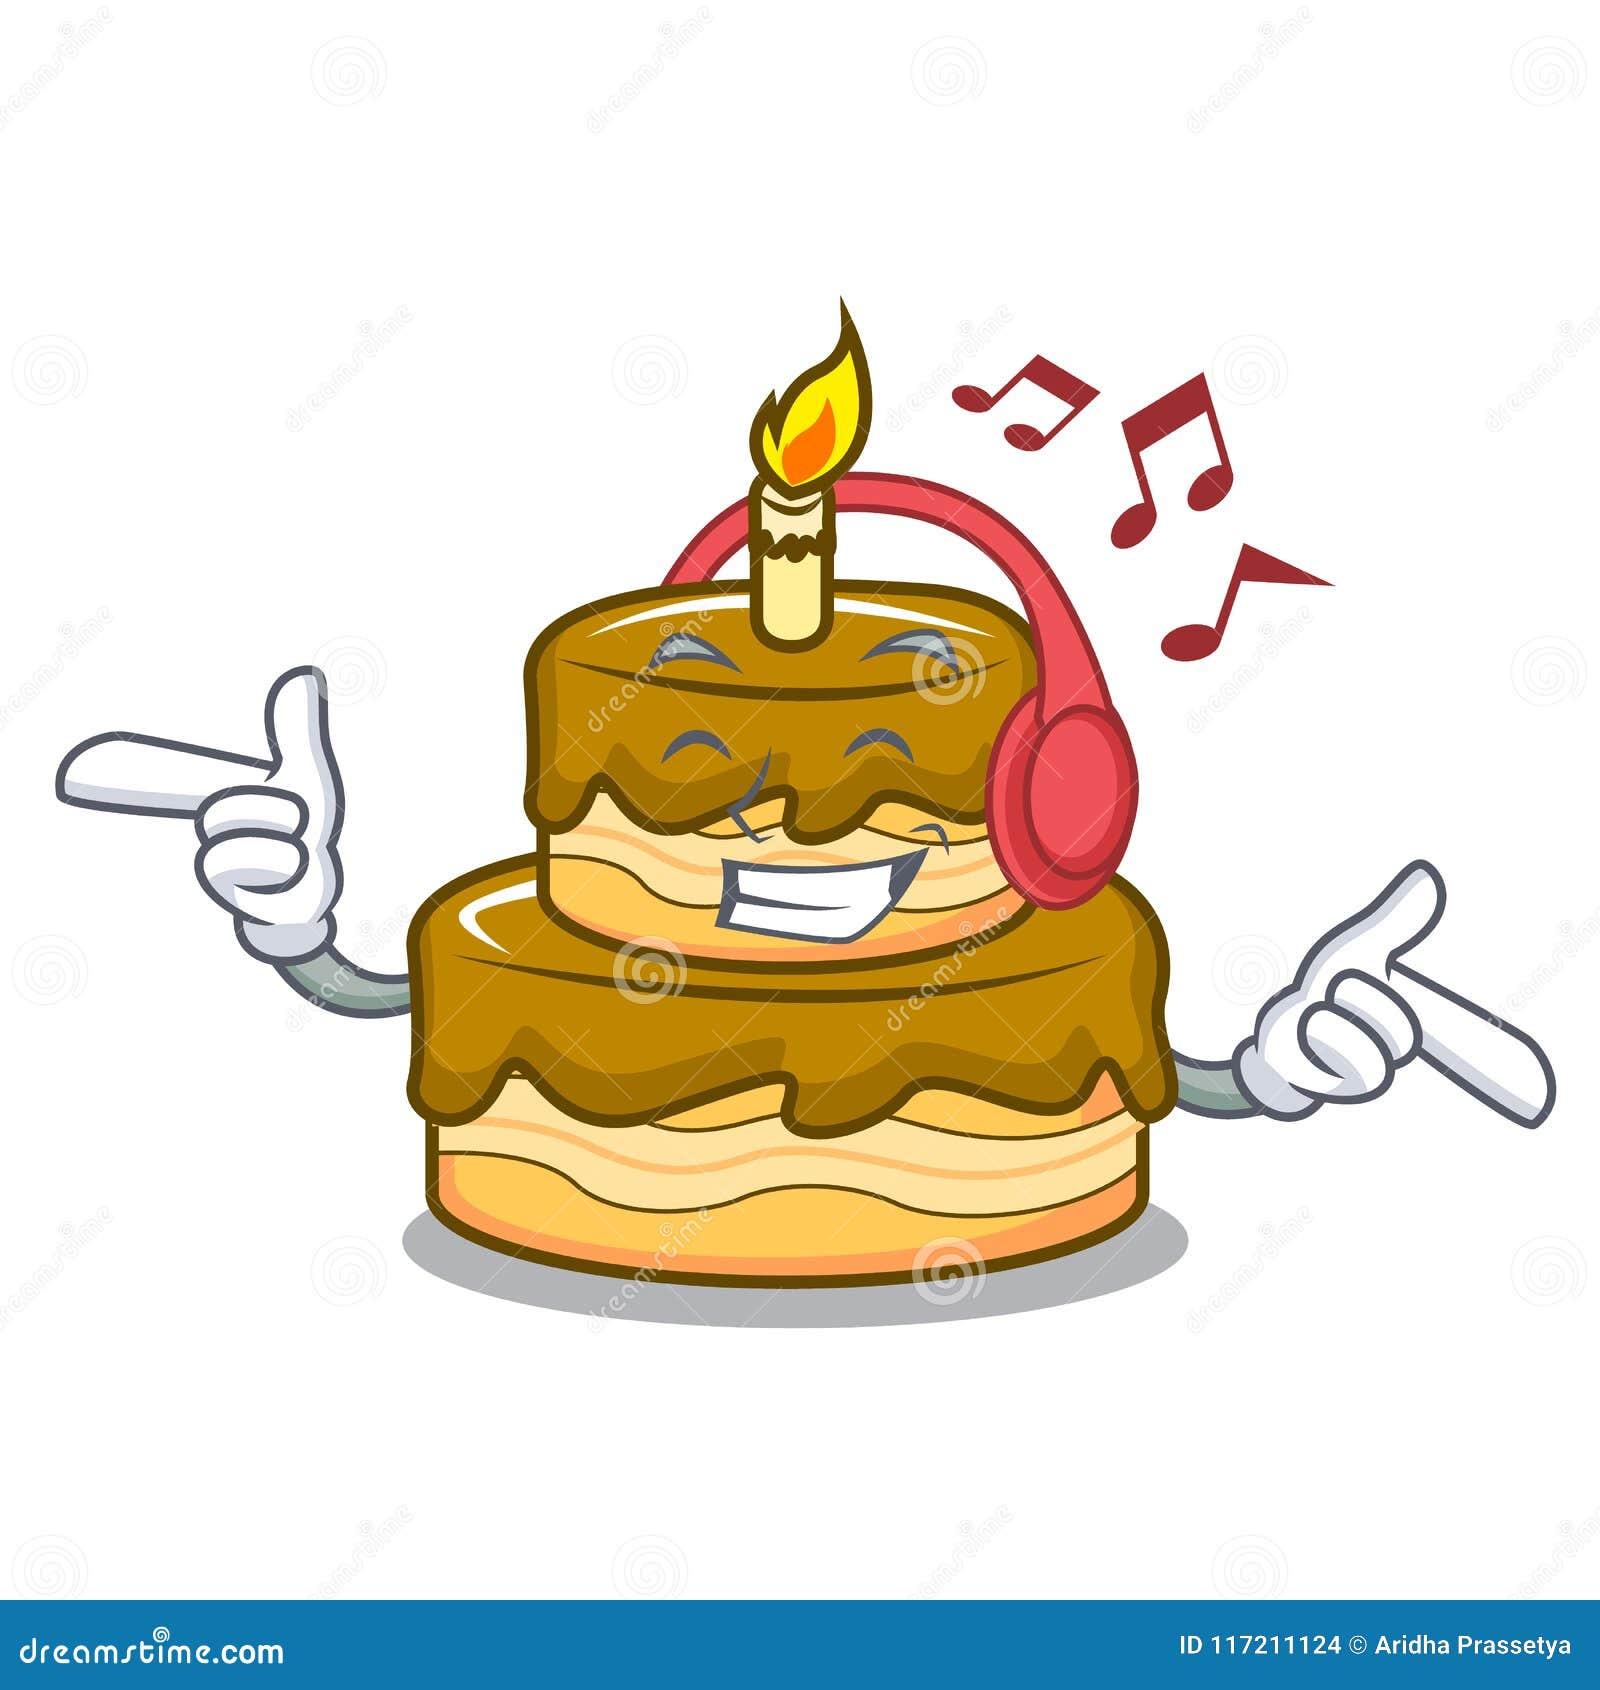 Terrific Listening Music Birthday Cake Mascot Cartoon Stock Vector Funny Birthday Cards Online Alyptdamsfinfo